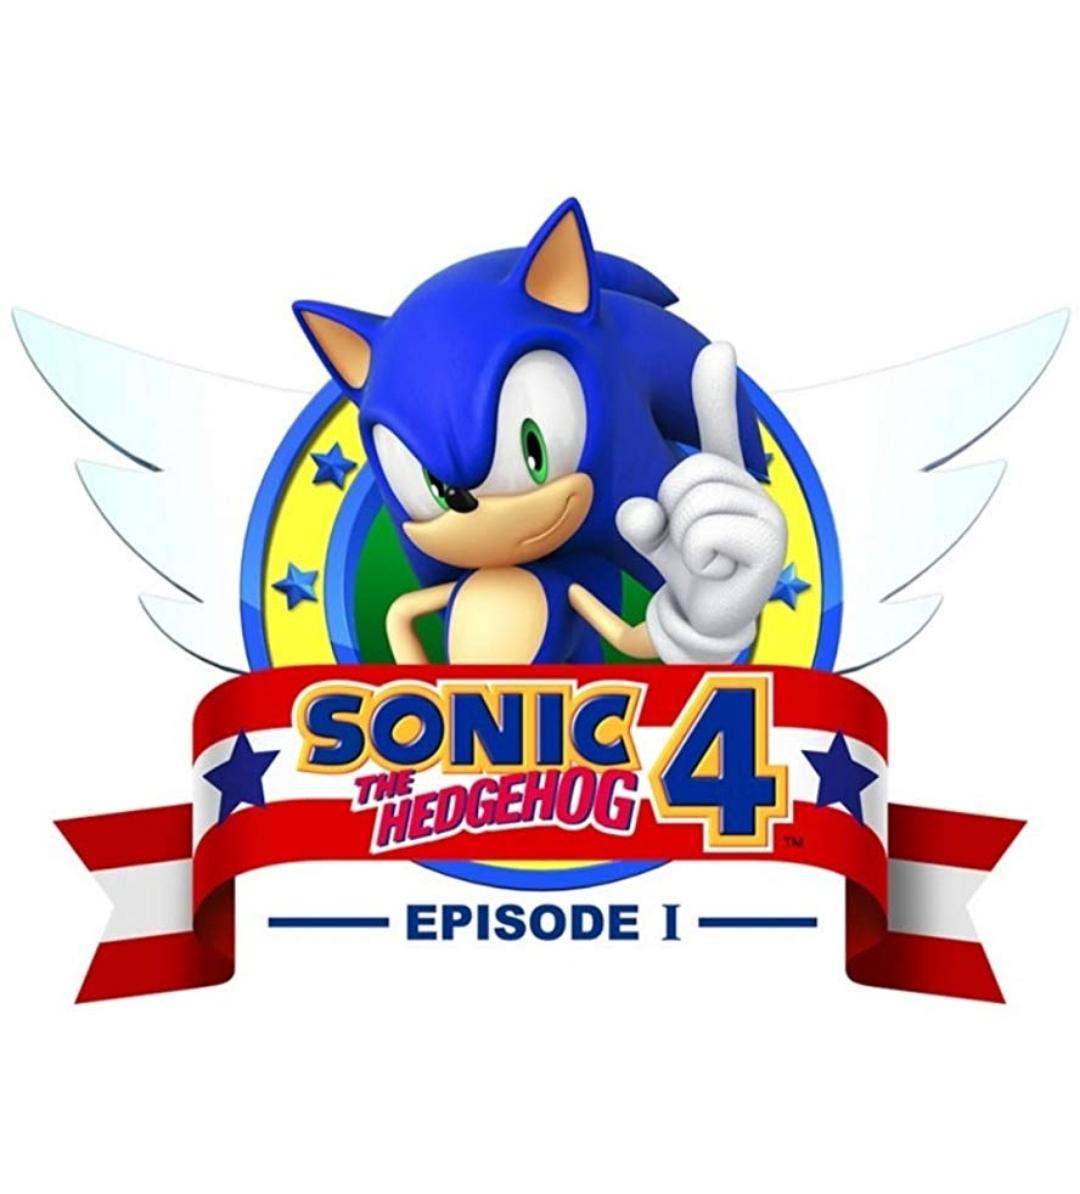 Sonic the Hedgehog 4: Episode 1 (Video Game 2010) - IMDb